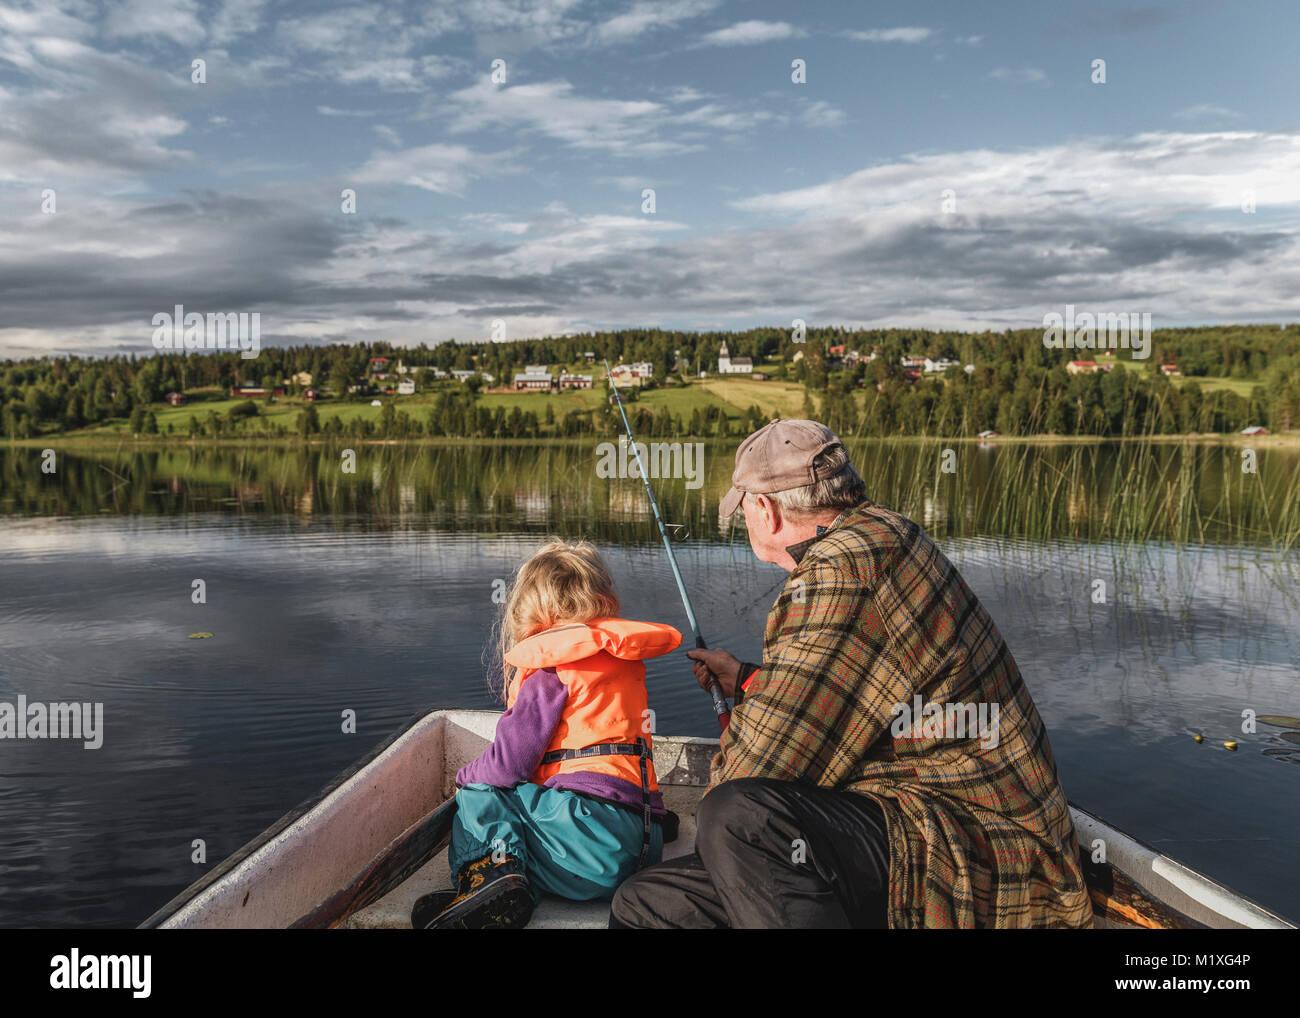 Grandfather and granddaughter fishing Borgvattnet, Sweden - Stock Image